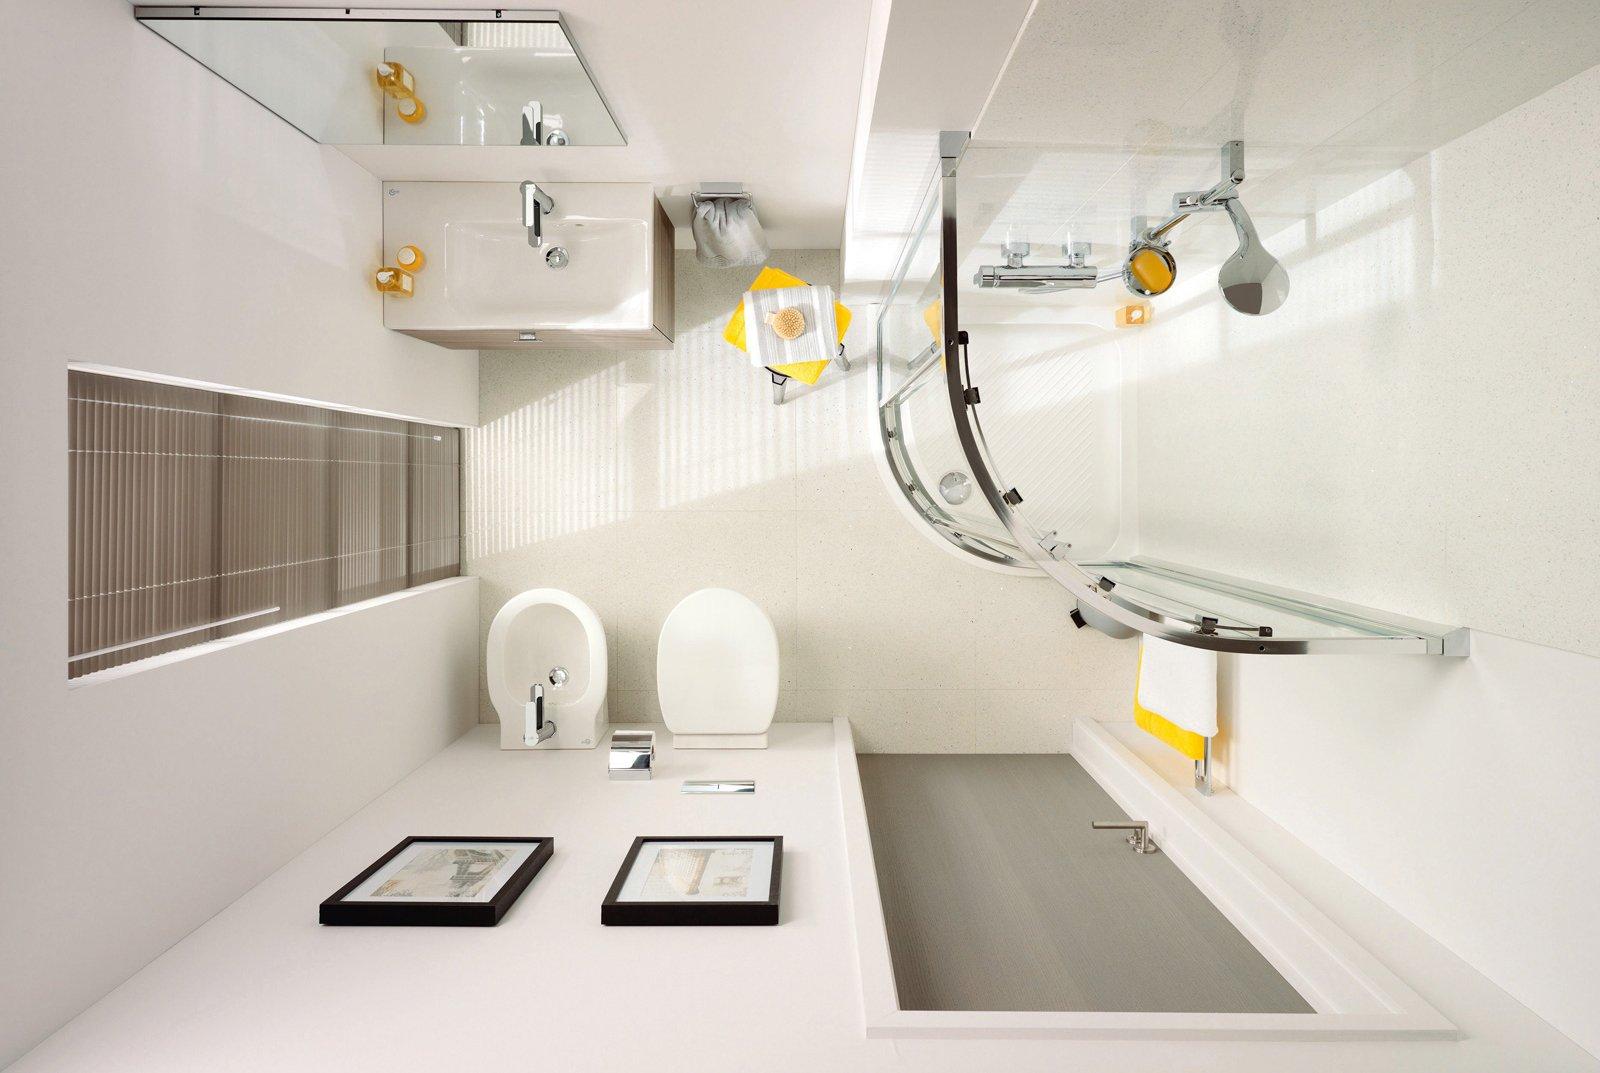 100+ [ esempi di bagni moderni ] | bagni moderni grigi duylinh for ... - Bagni Moderni Piccoli Spazi